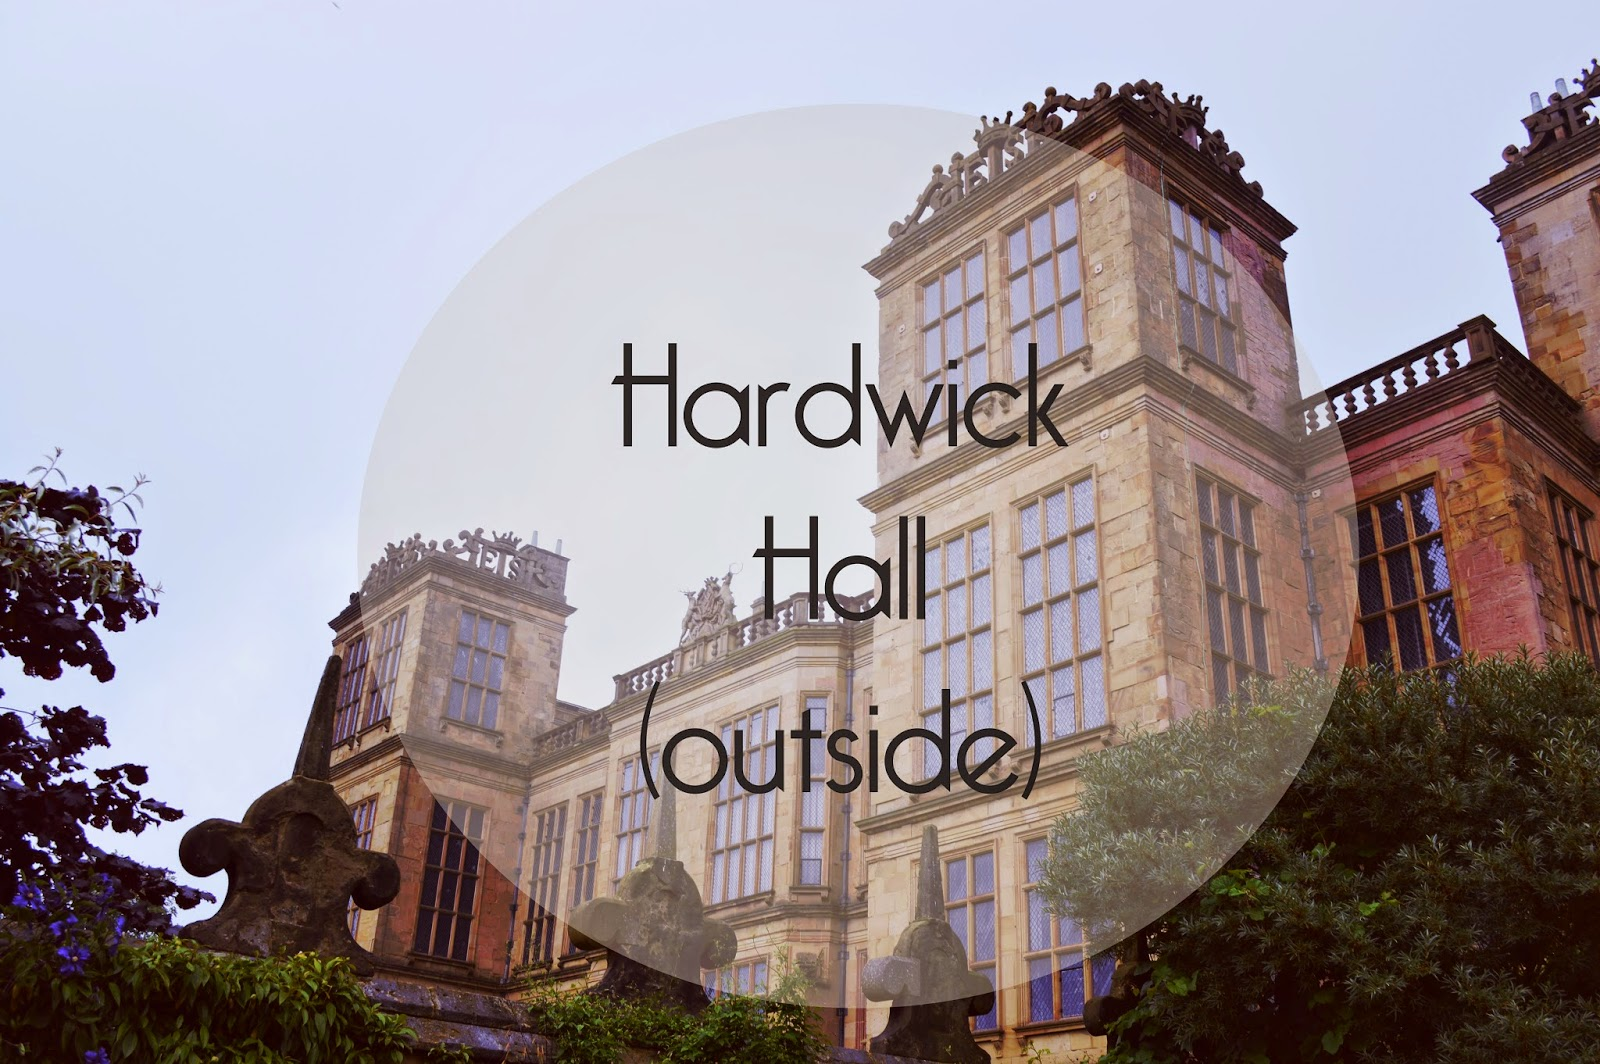 Harwick Hall, outside, exterior, Bess of Harwick, Elizabeth Talbot, Shrewsbury, Elizabethan, historical property, Malfoy Manor, Harry Potter film location, country house, Robert Smythson, Derbyshire, visit, photographs, pictures, UK, history